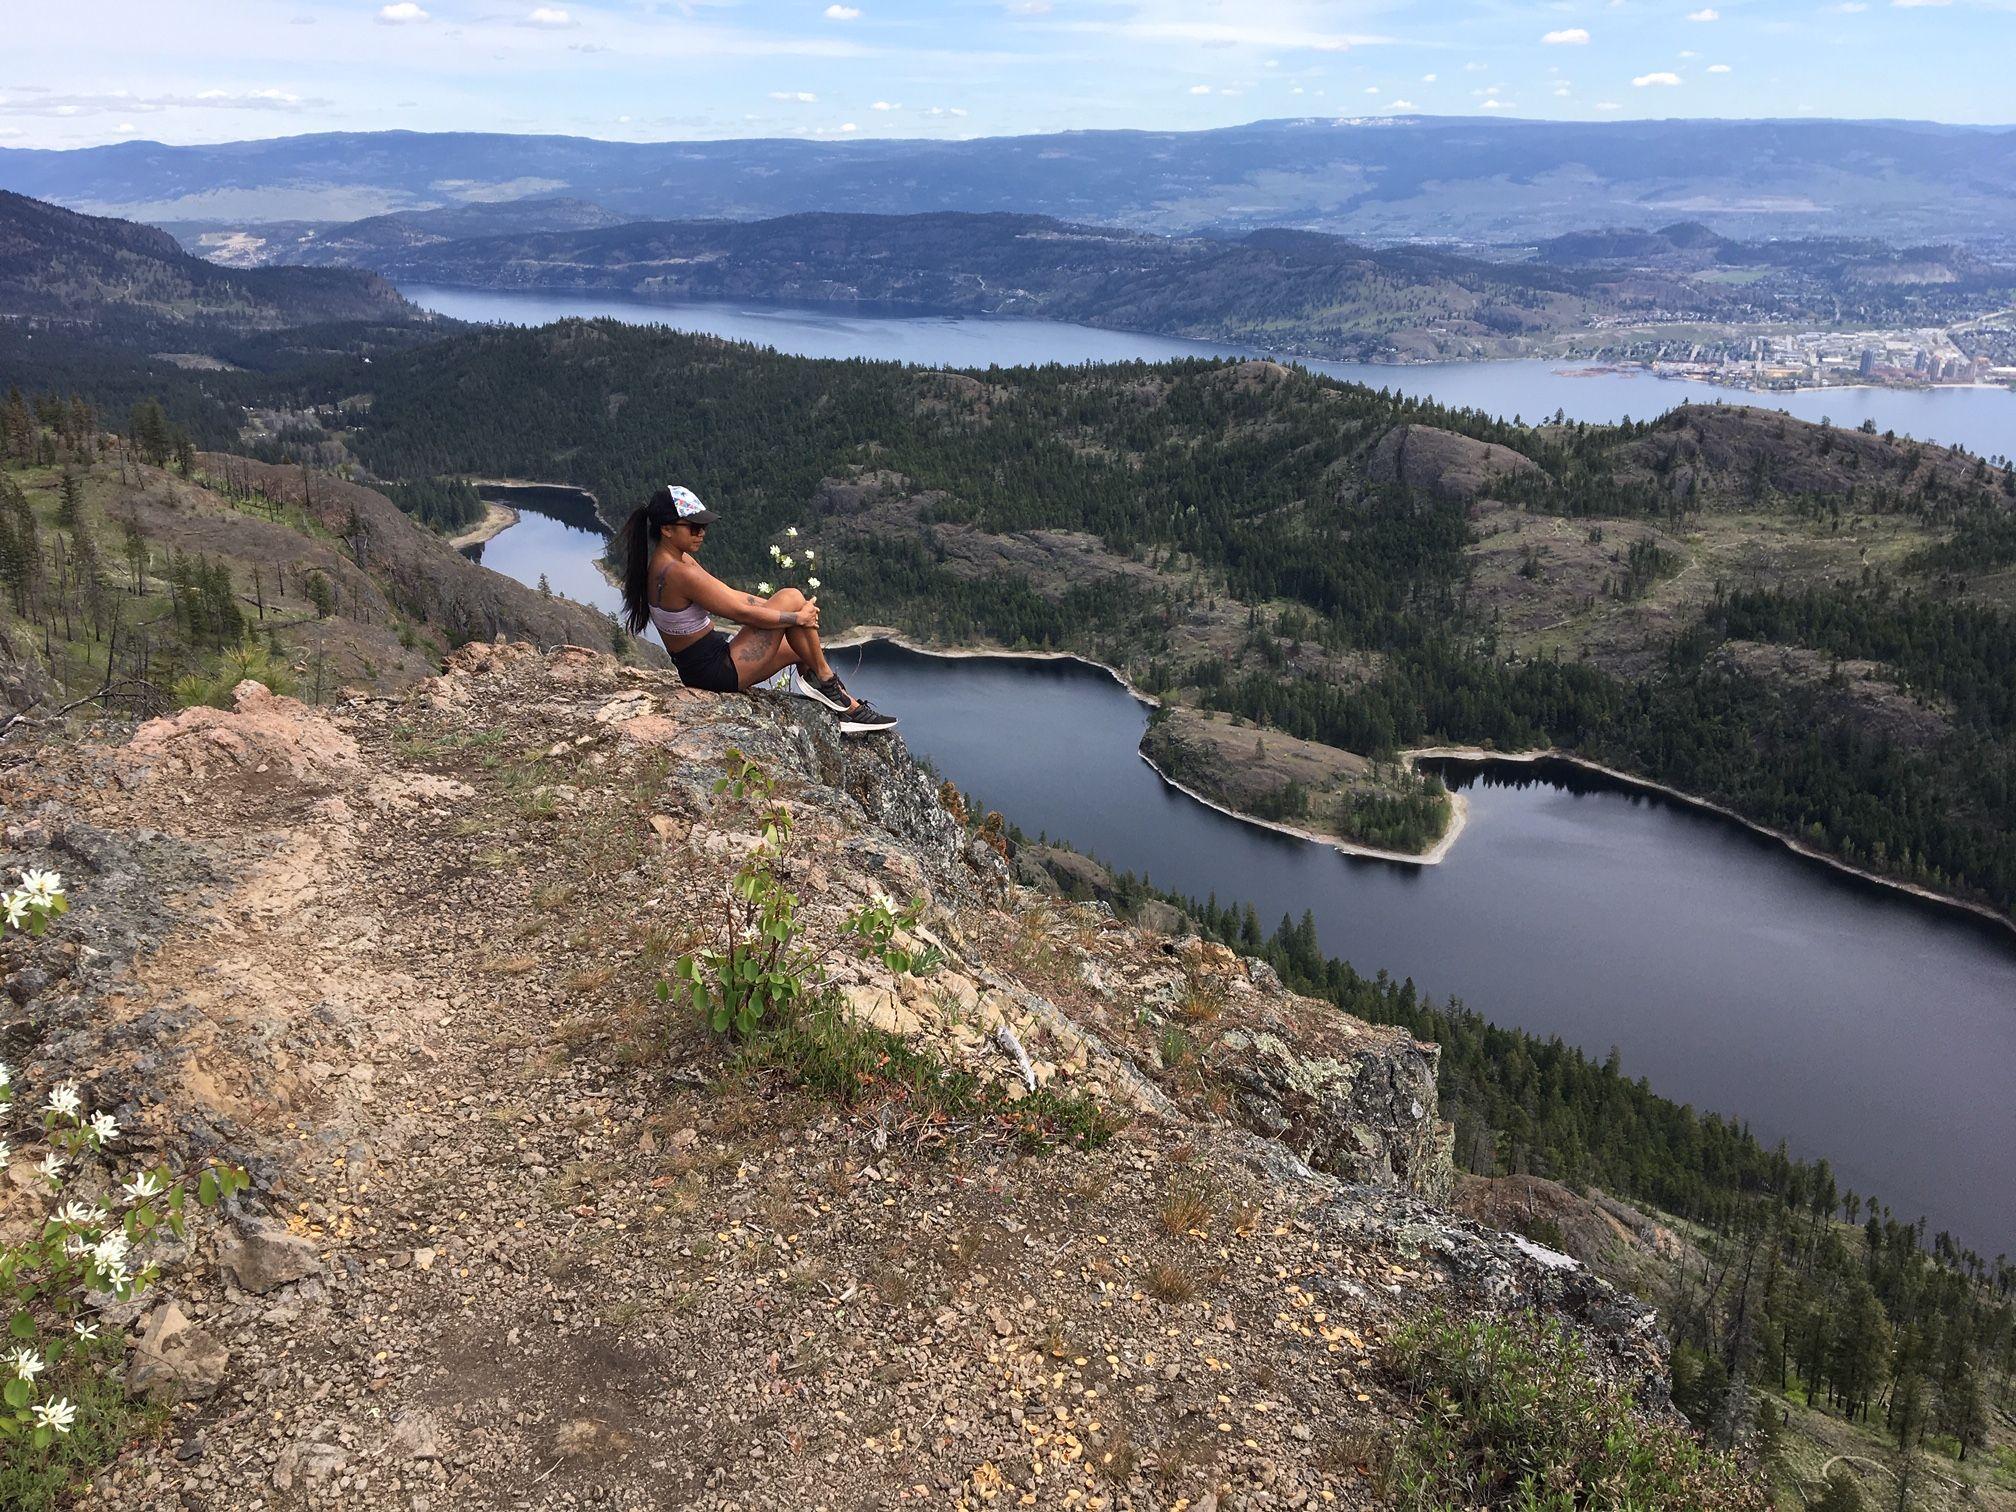 Top of McDougall Rim Trail Kelowna, Okanagan Valley, British Columbia.